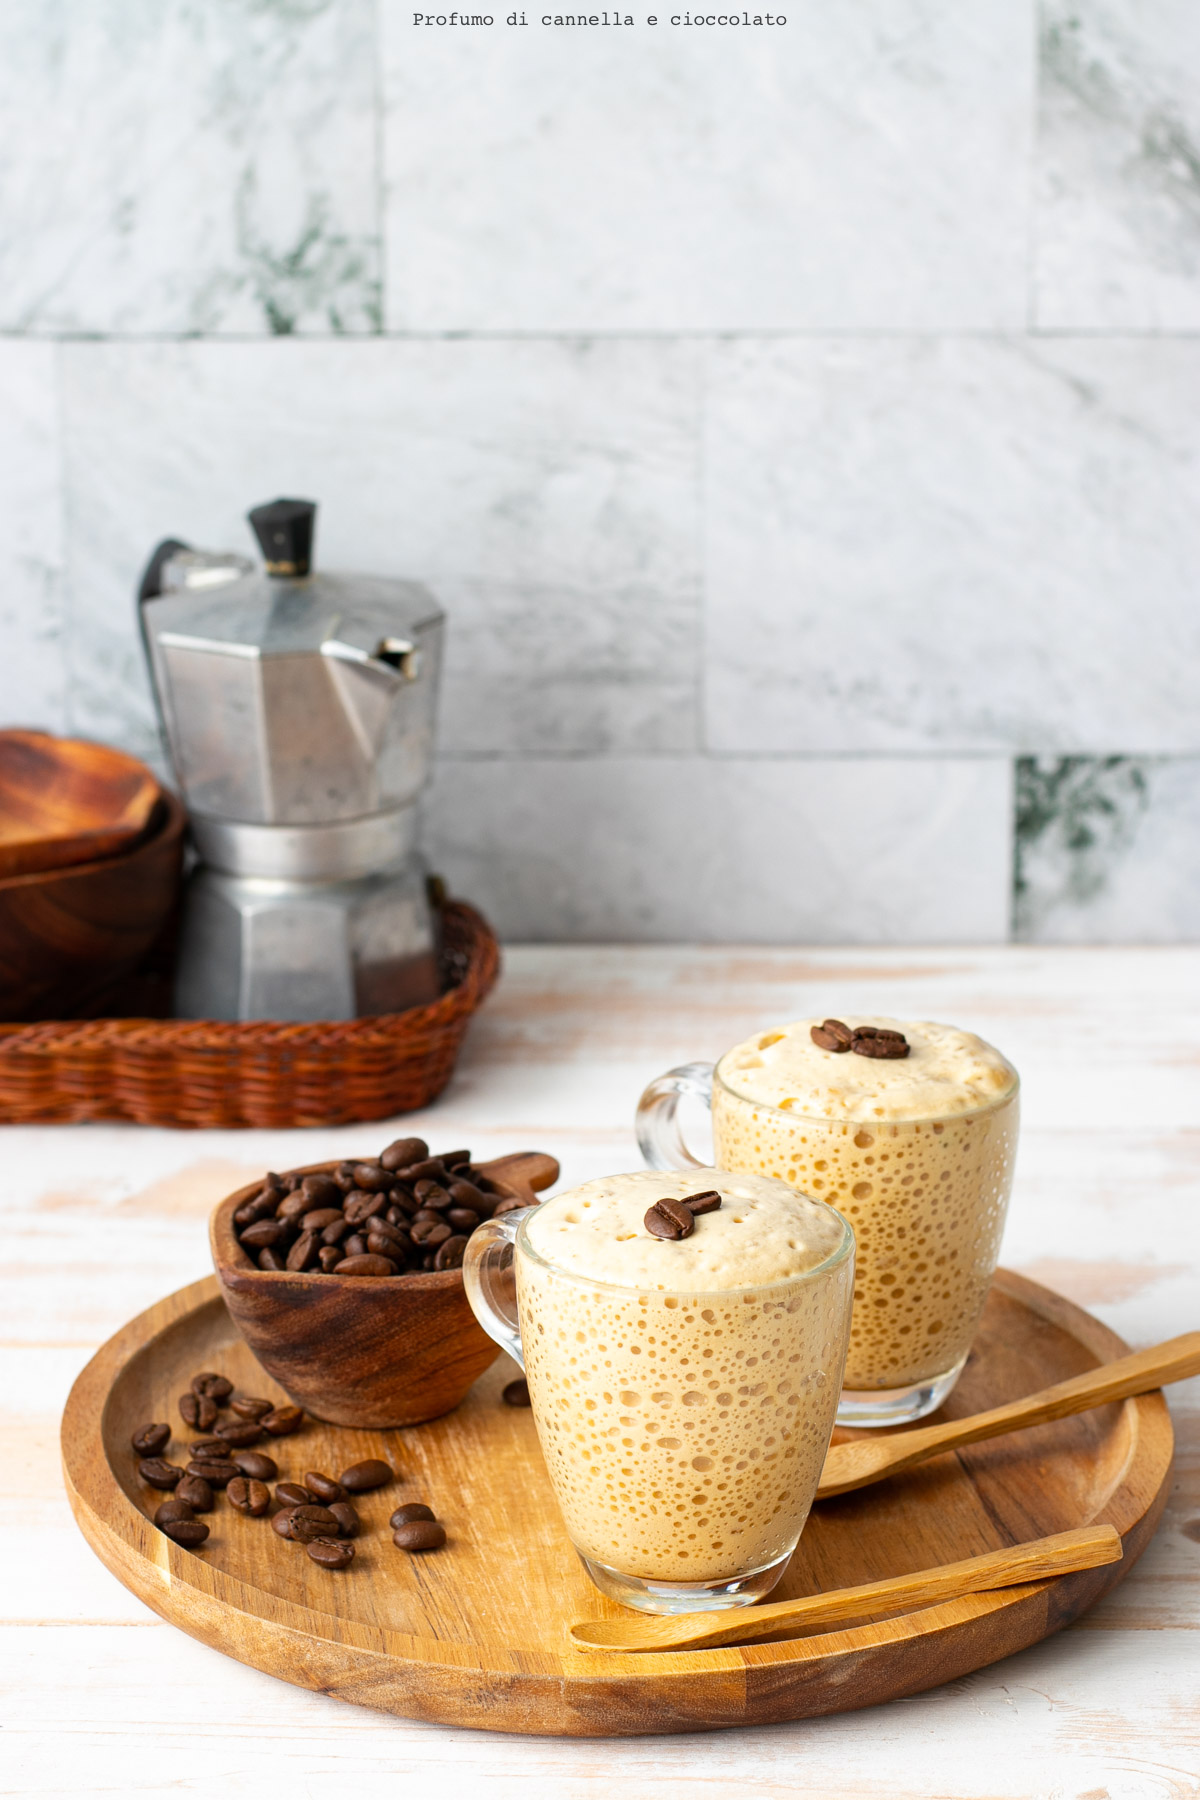 Spuma al caffè senza lattosio